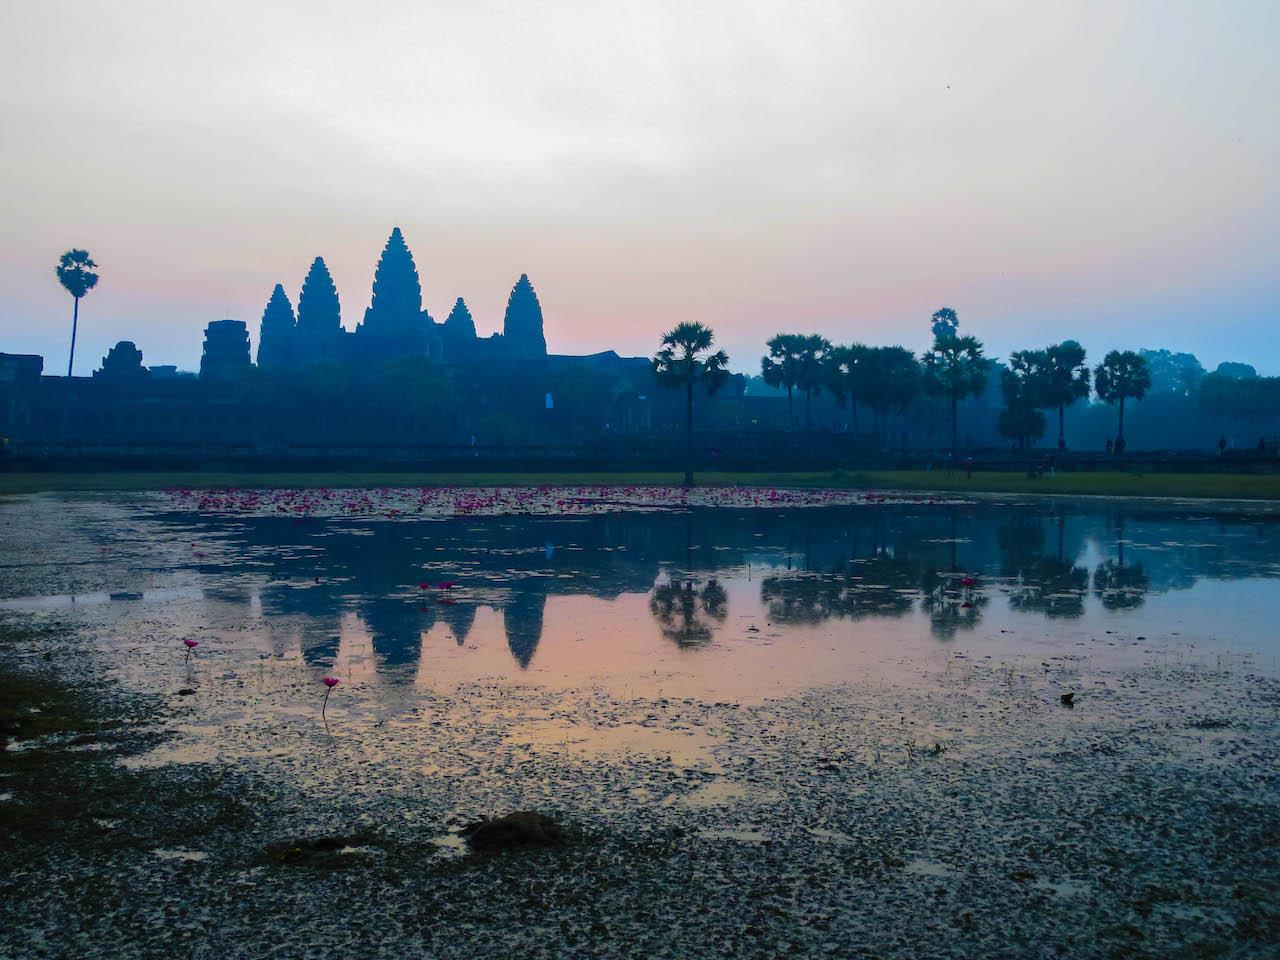 Farbenspiel bei Angkor Wat...